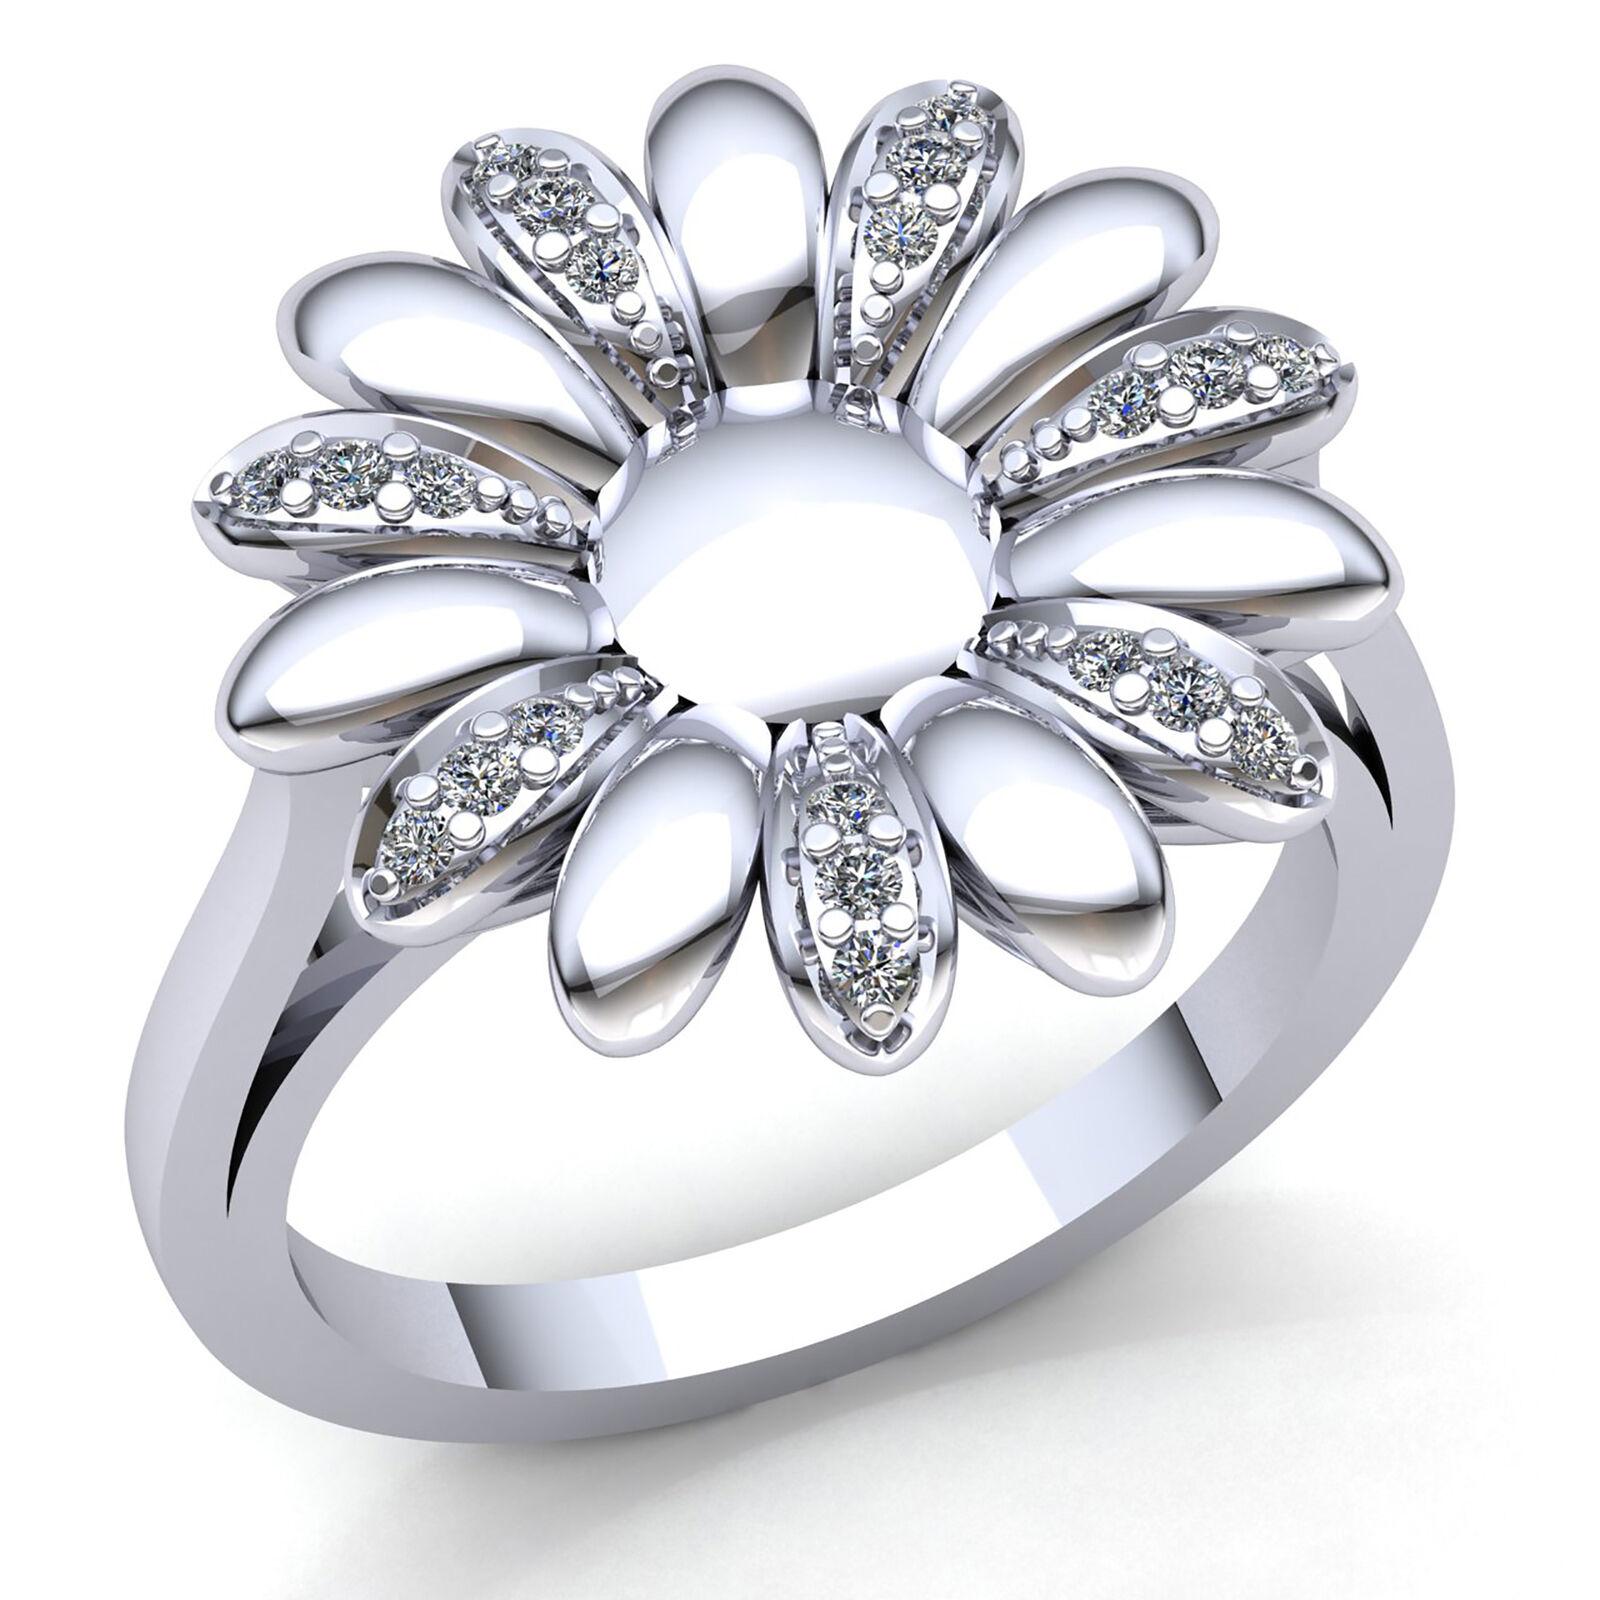 0.25ct Round Cut Diamond Ladies Vintage Floral Anniversary Ring 10K gold